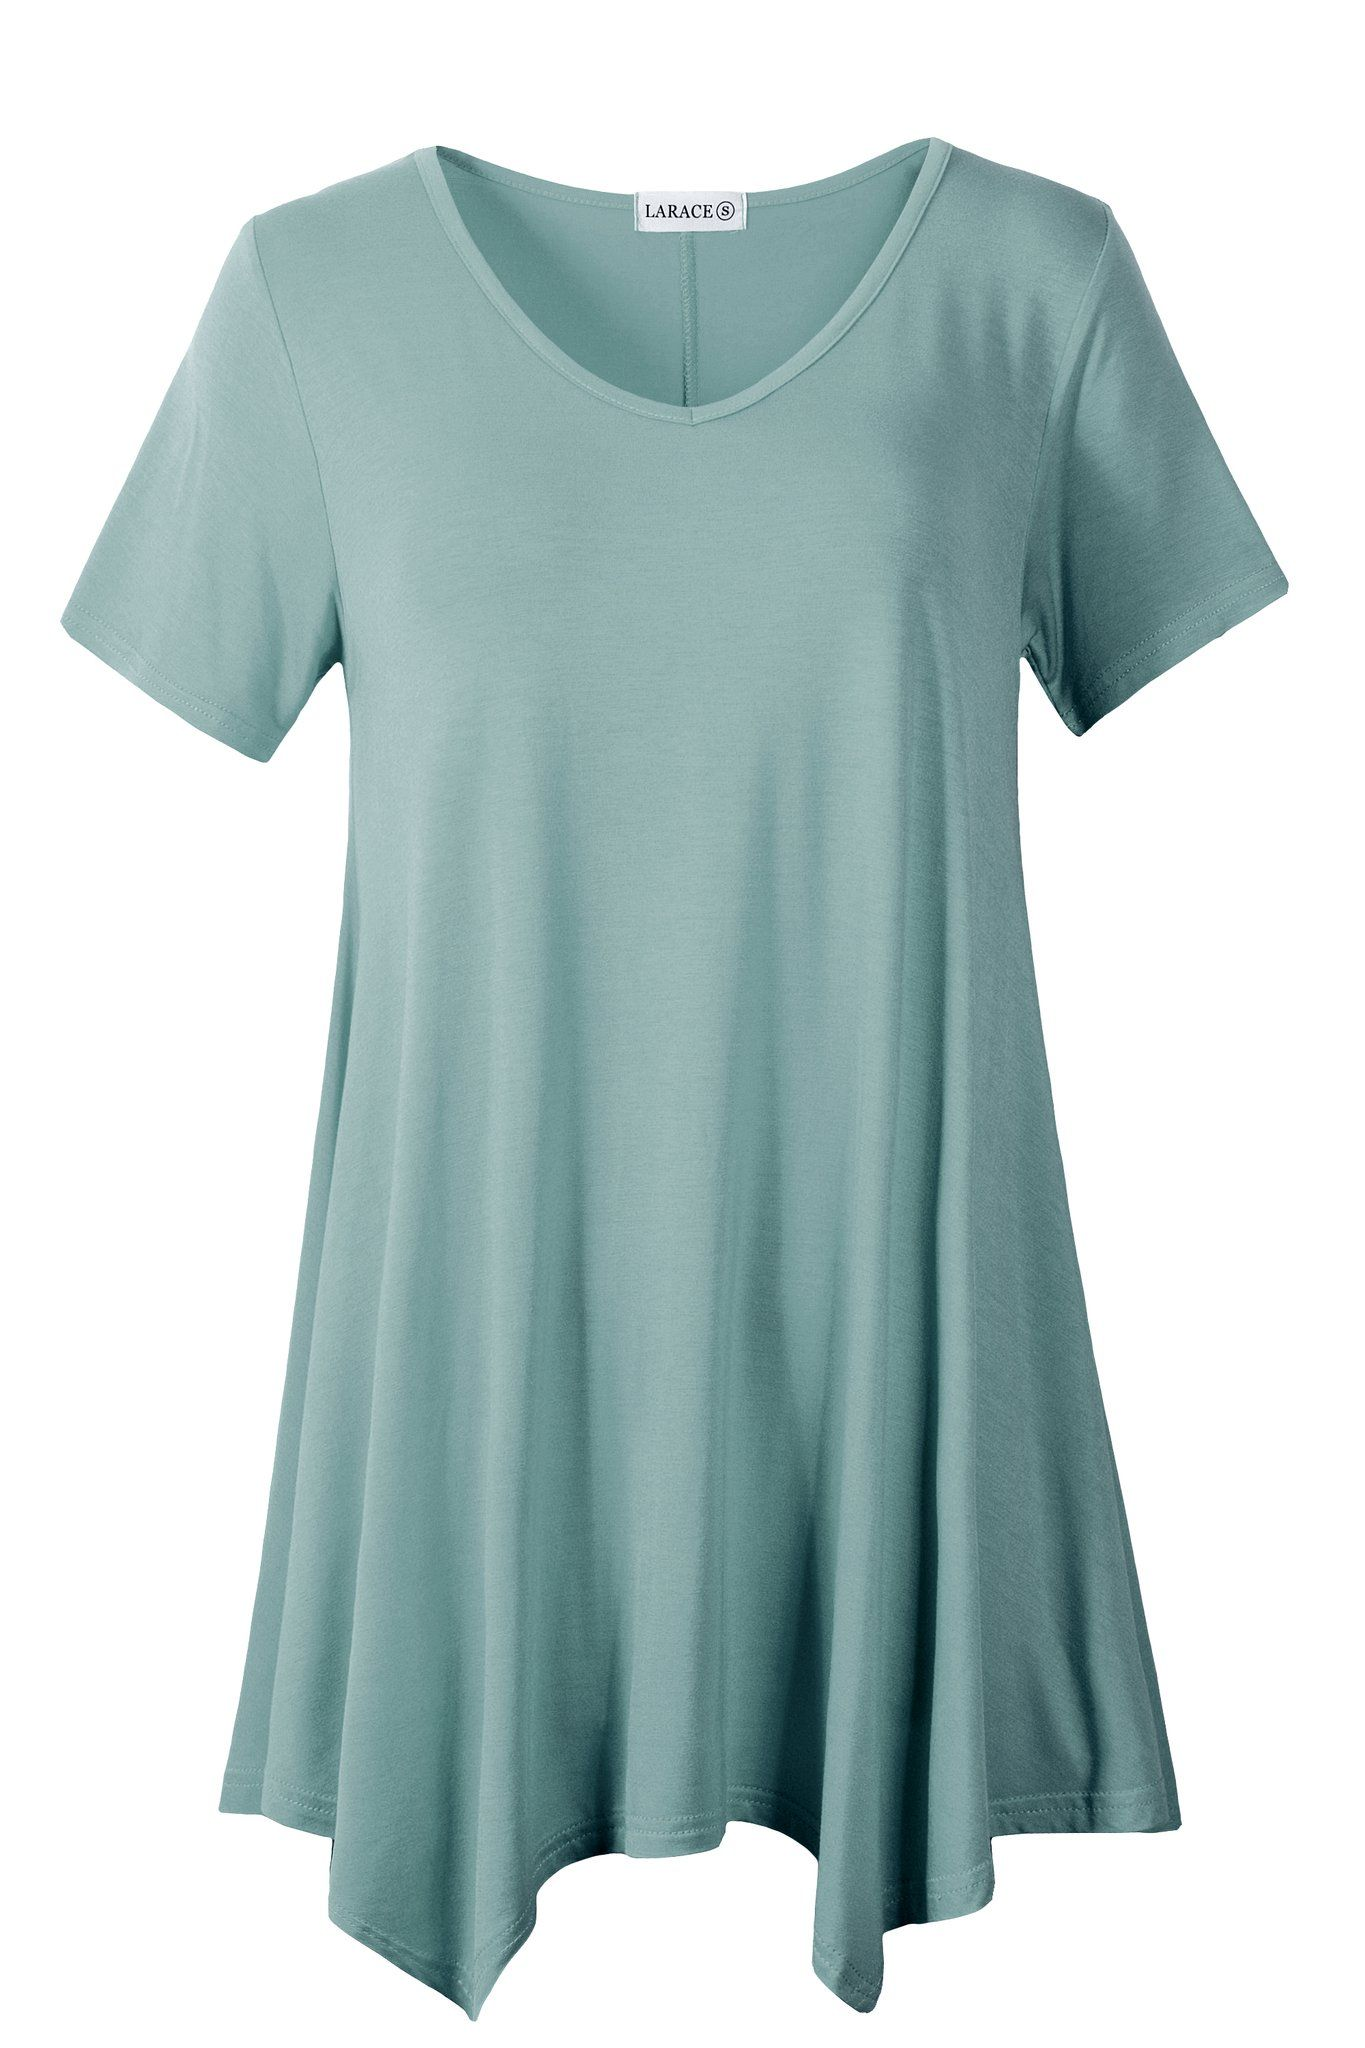 464261f18ecd Casual T Shirt V-Neck Tunic Tops for Leggings in 2019   CHEAP ...